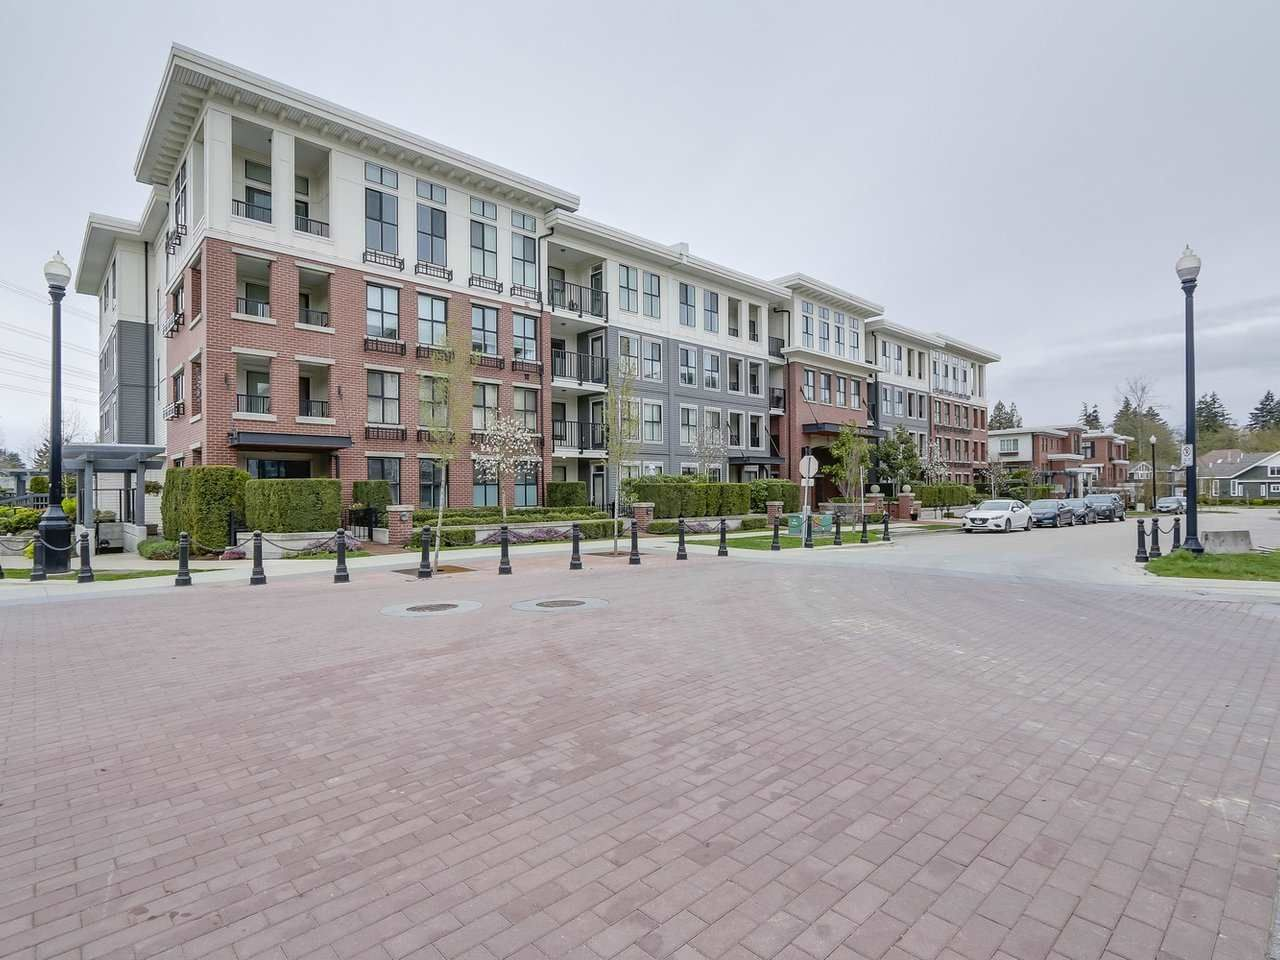 "Main Photo: 321 3323 151 Street in Surrey: Morgan Creek Condo for sale in ""Kingston House"" (South Surrey White Rock)  : MLS®# R2256585"